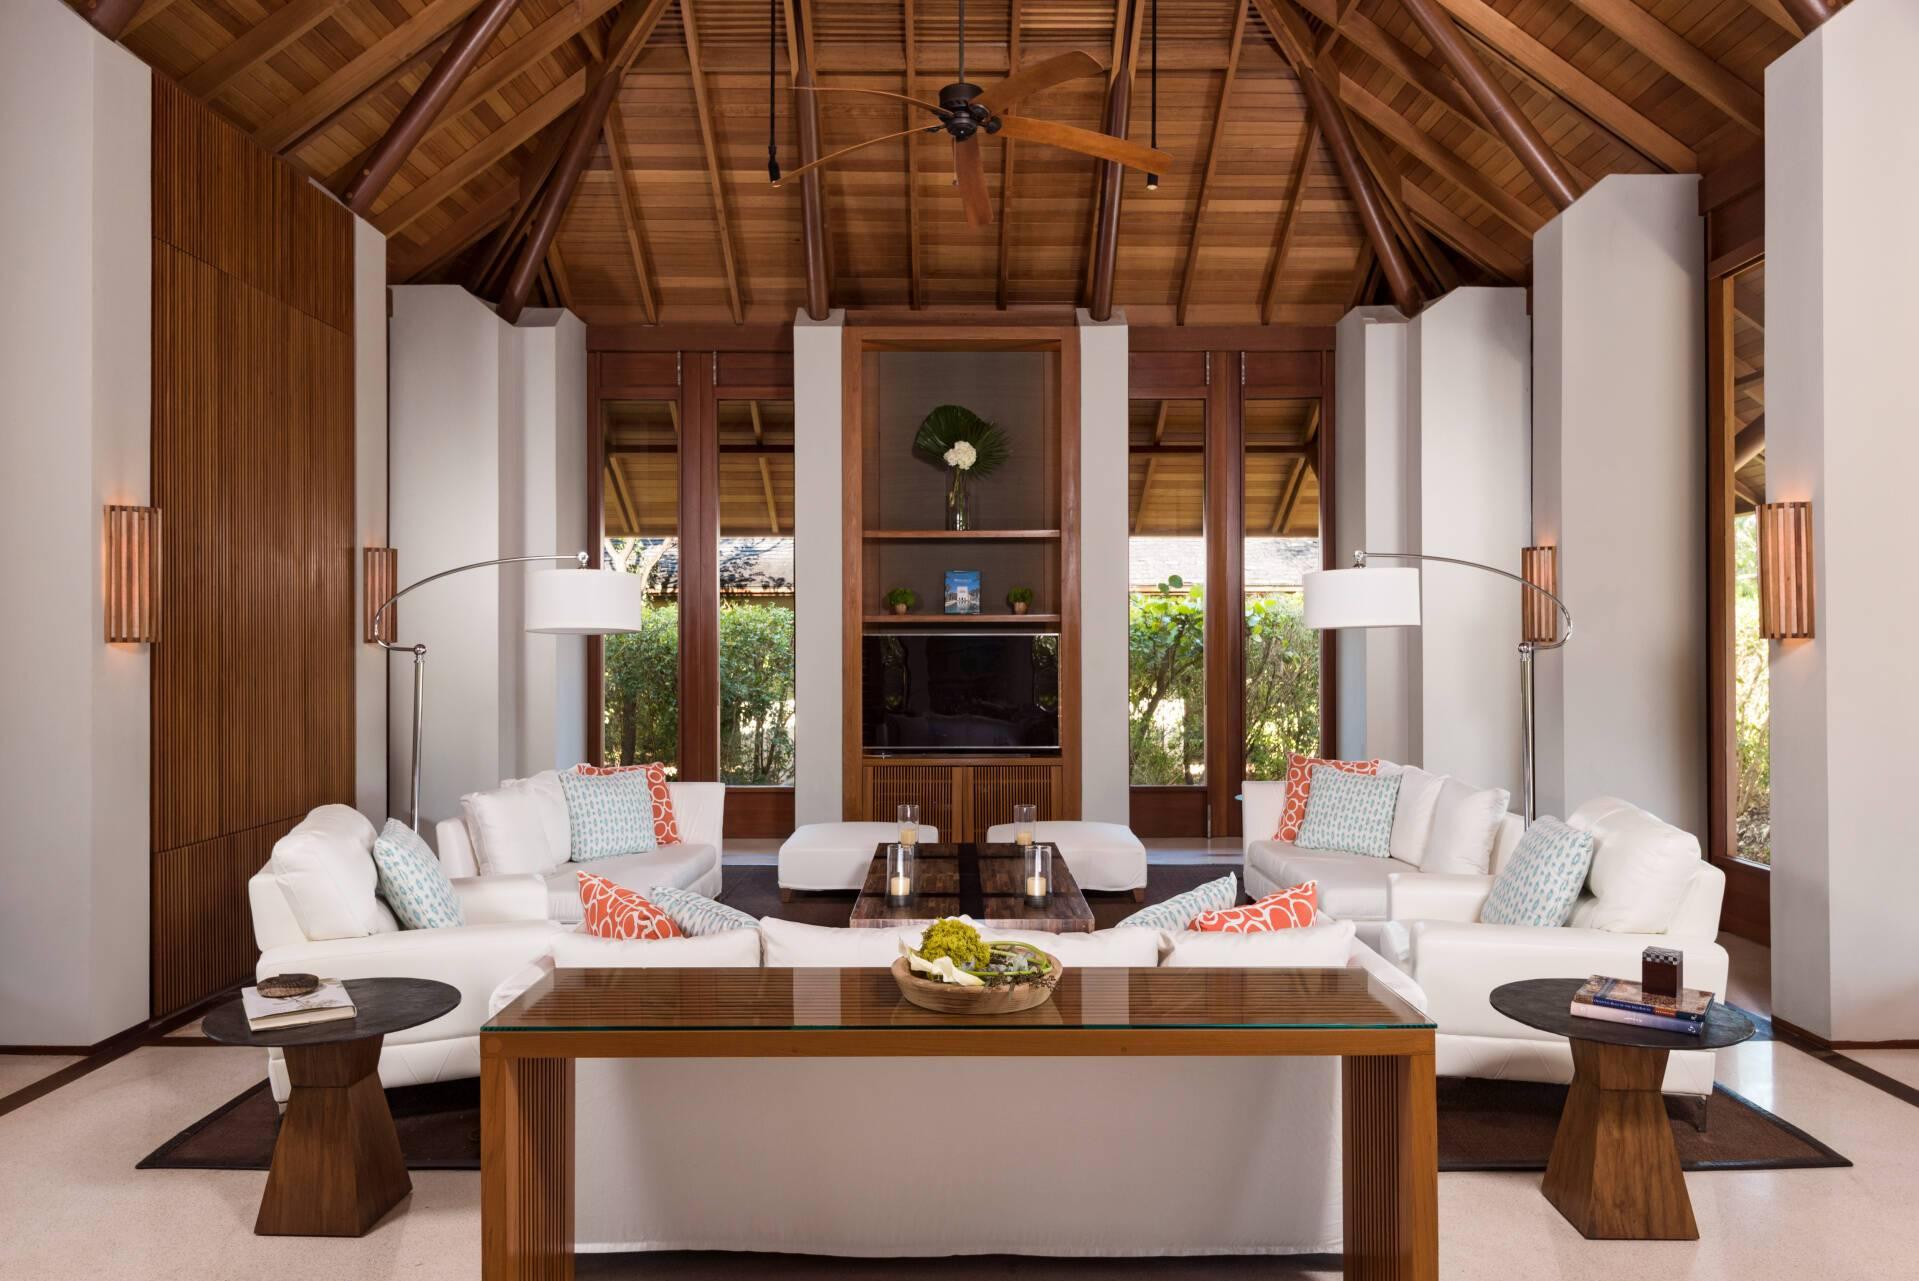 Amanyara Villa Salon Turks et Caicos